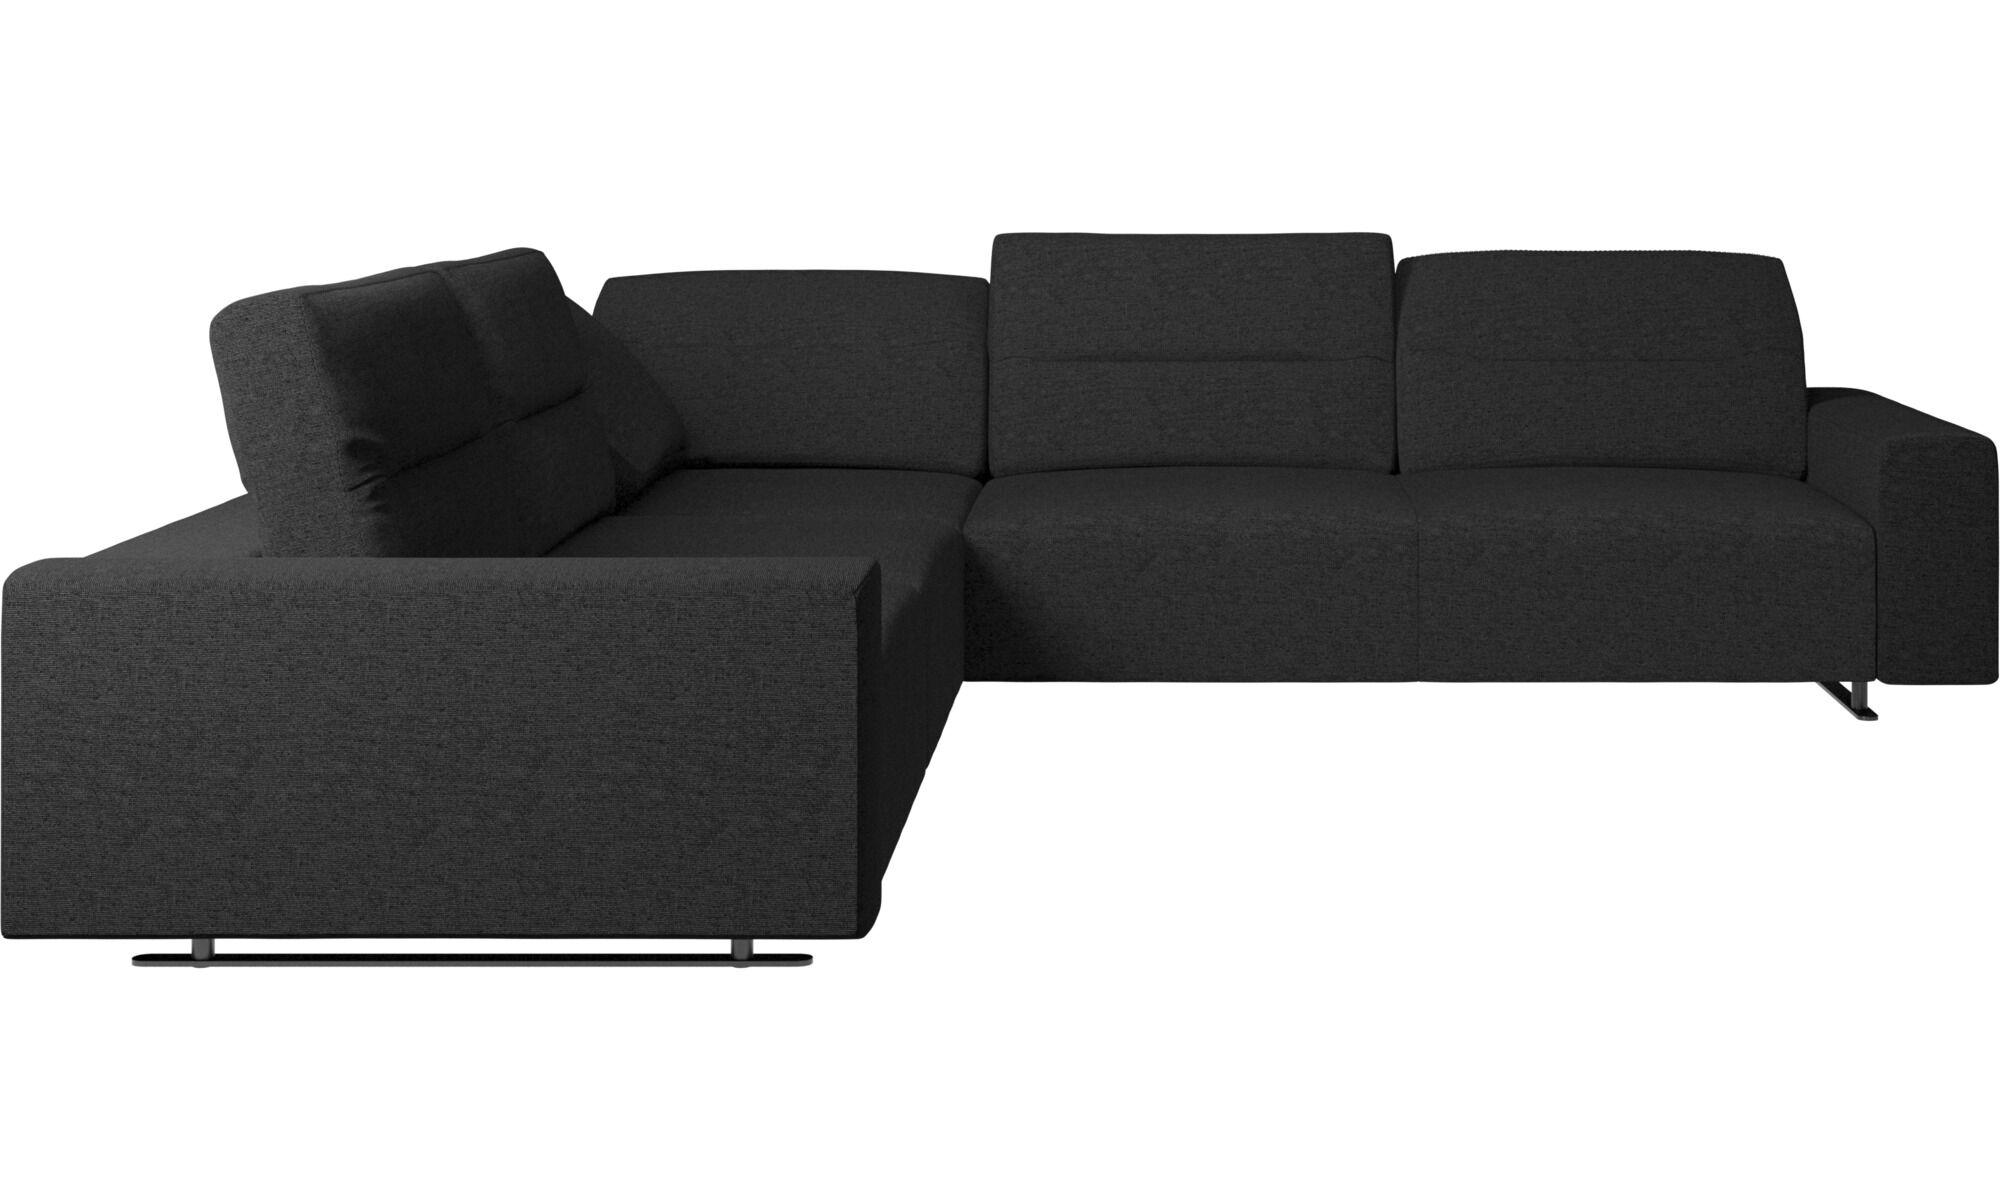 Awesome Corner Sofas   Hampton Corner Sofa With Adjustable Back   Grey   Fabric